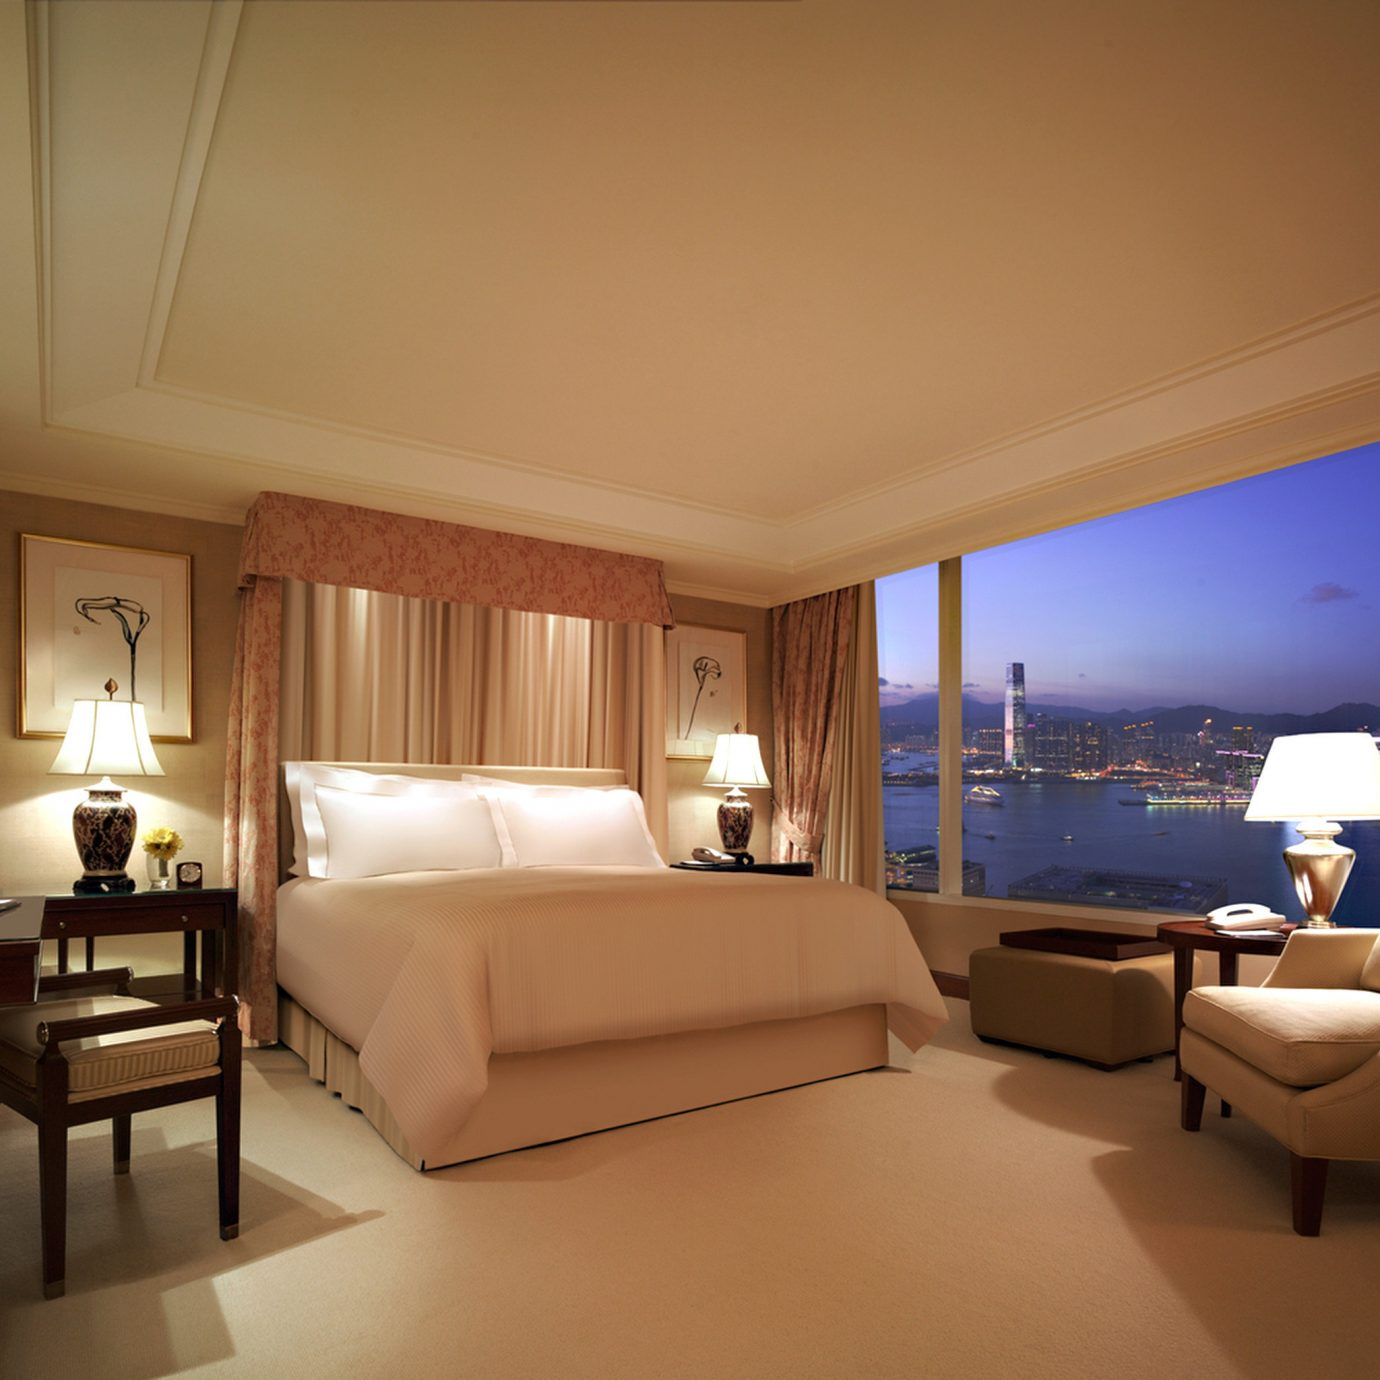 Bedroom Business City Elegant Scenic views property Suite living room condominium yacht